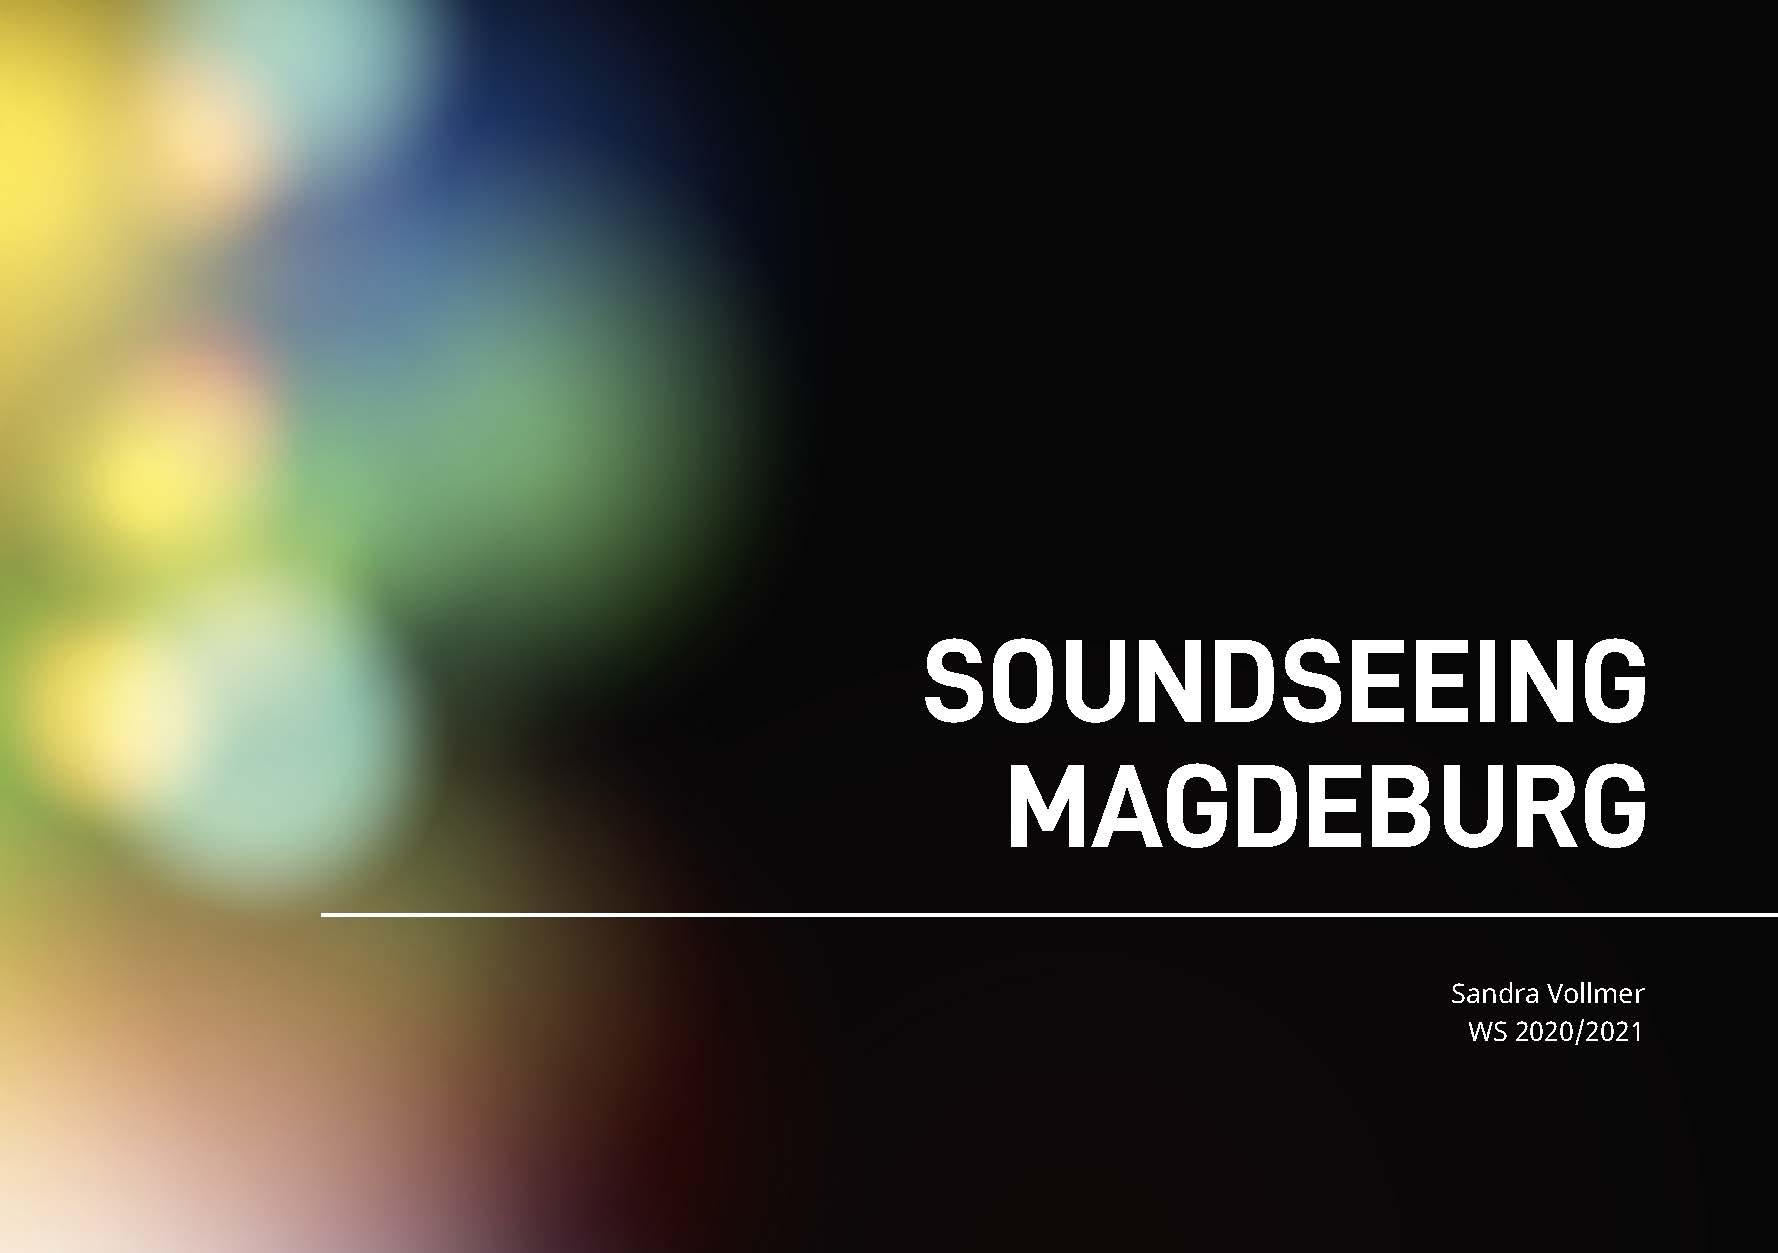 Soundseeing Magdeburg